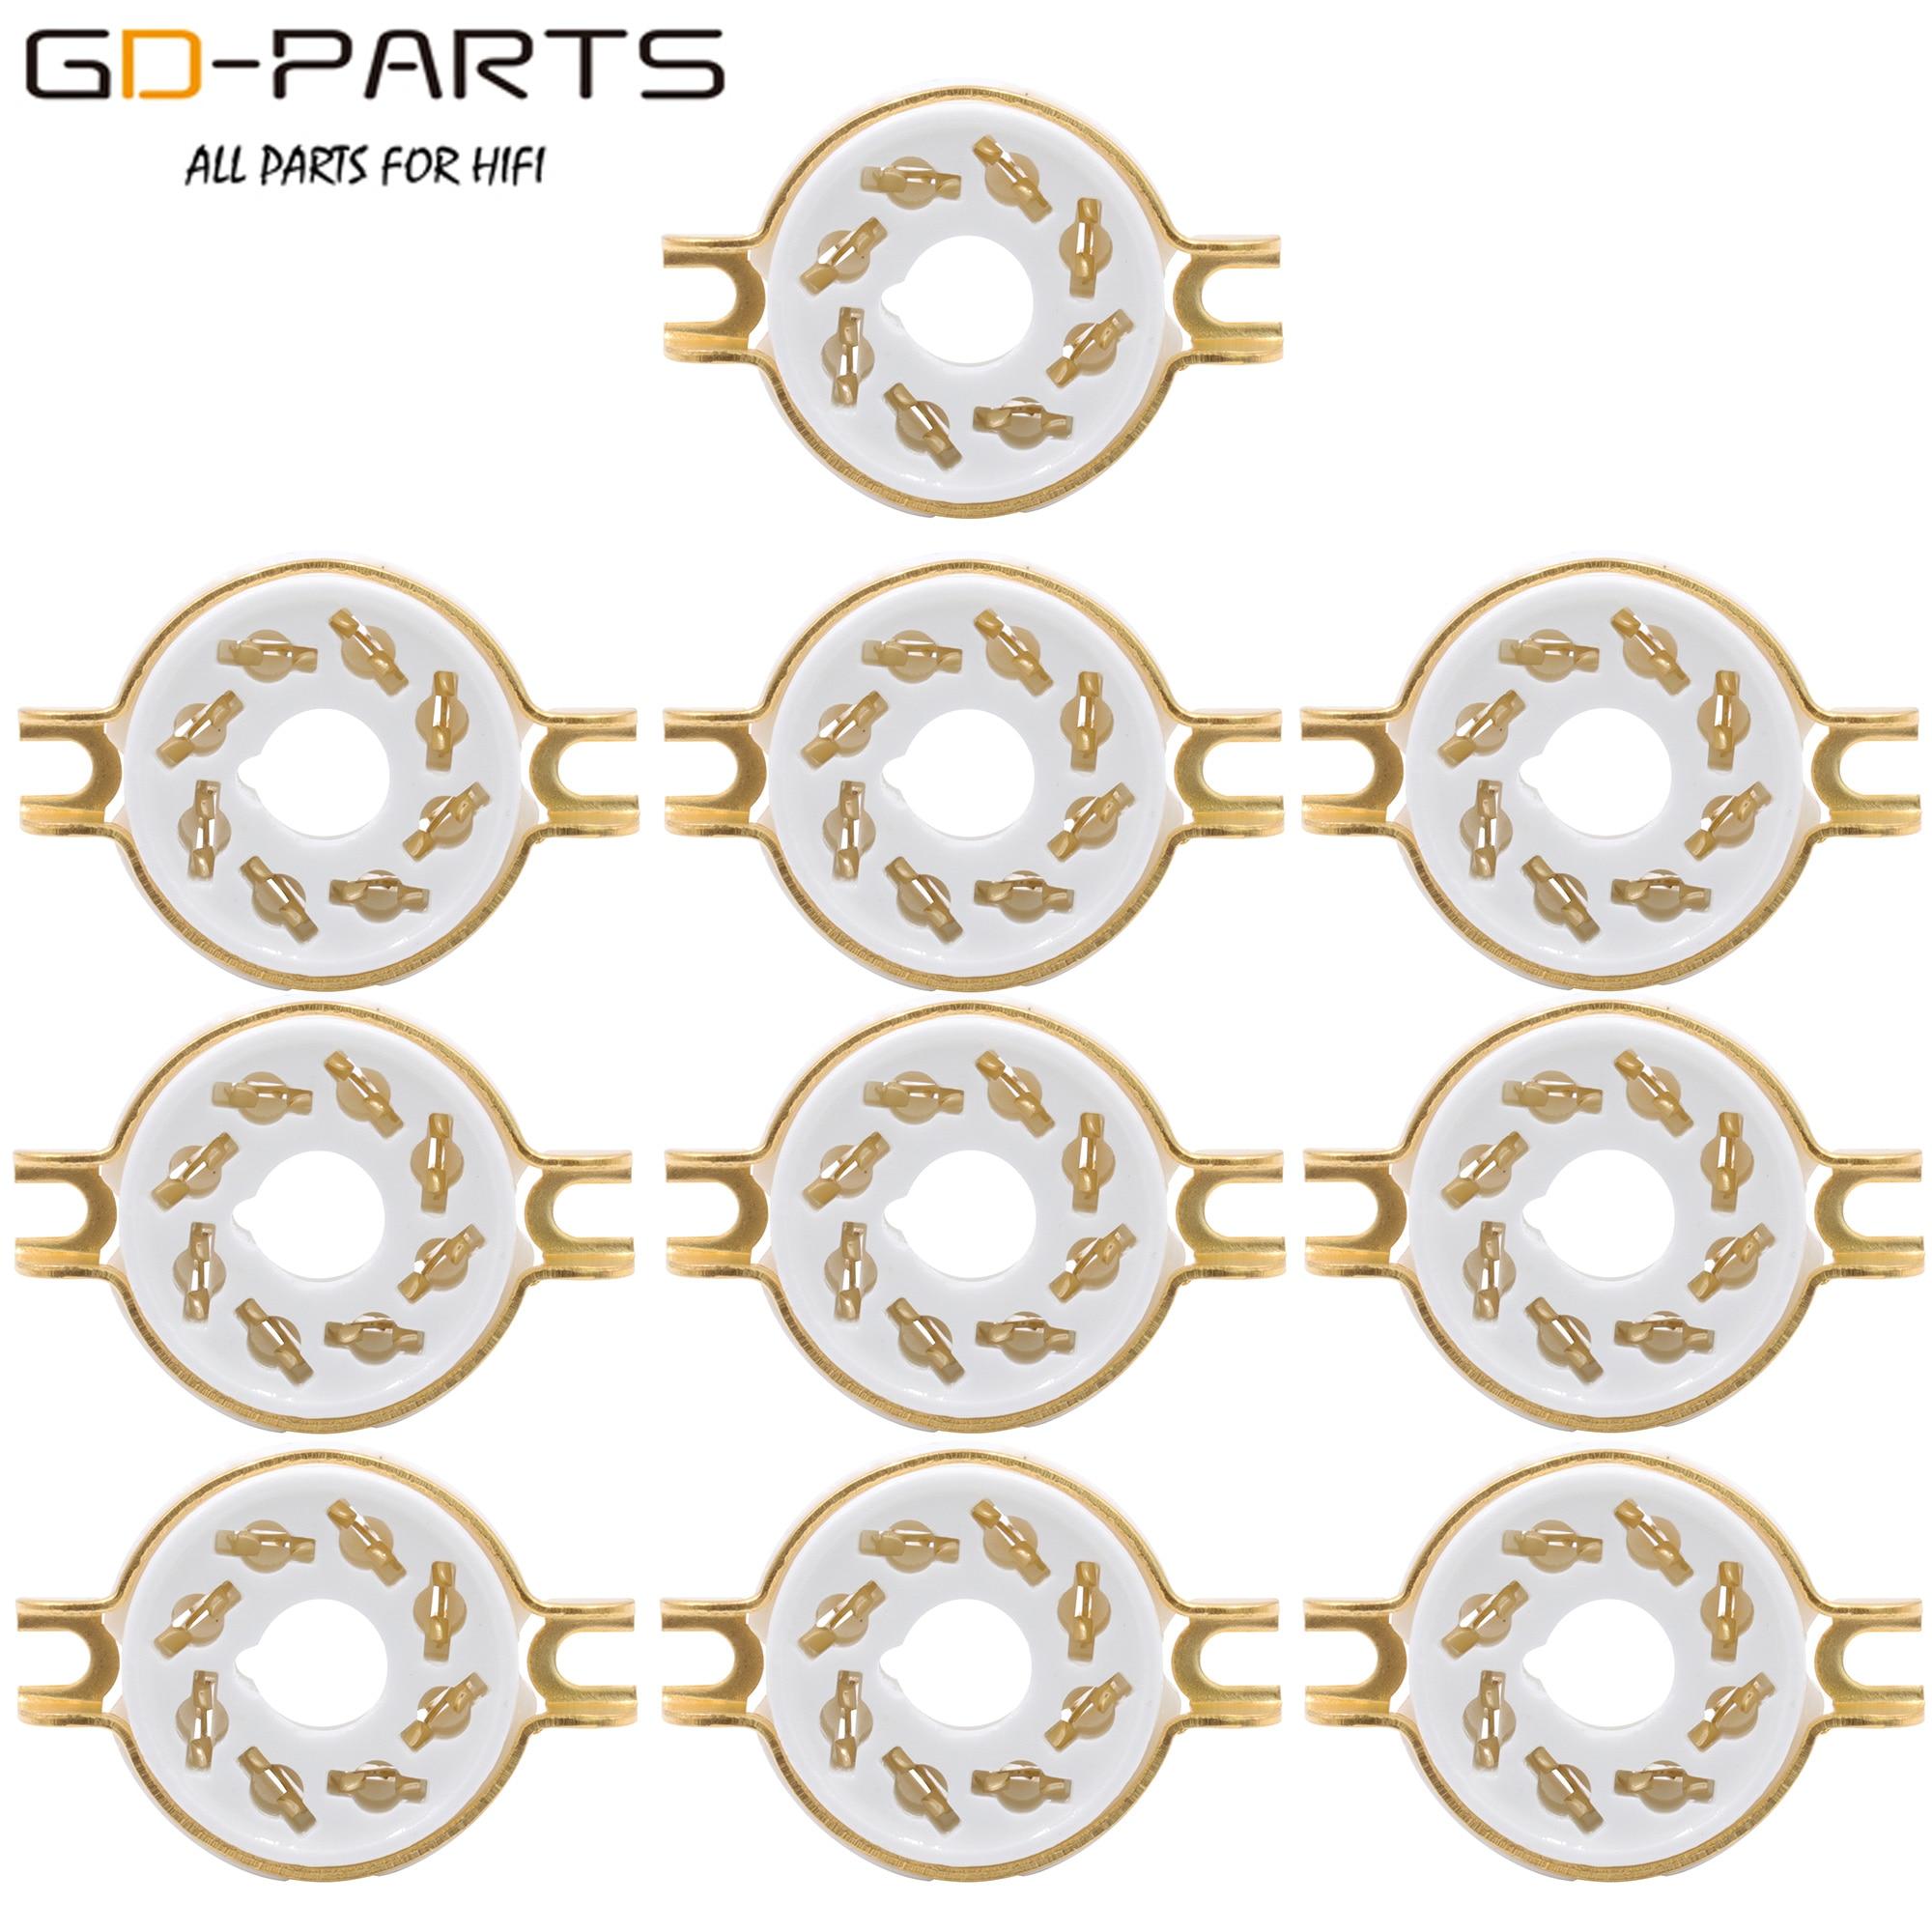 10PCS Chassis Mount 8 Pin K8A Octal Ceramic Tube Sockets for KT88 KT66 6SN7 5AR4 GZ34 5881 6V6 5U4G 6550 6J7 6SJ7